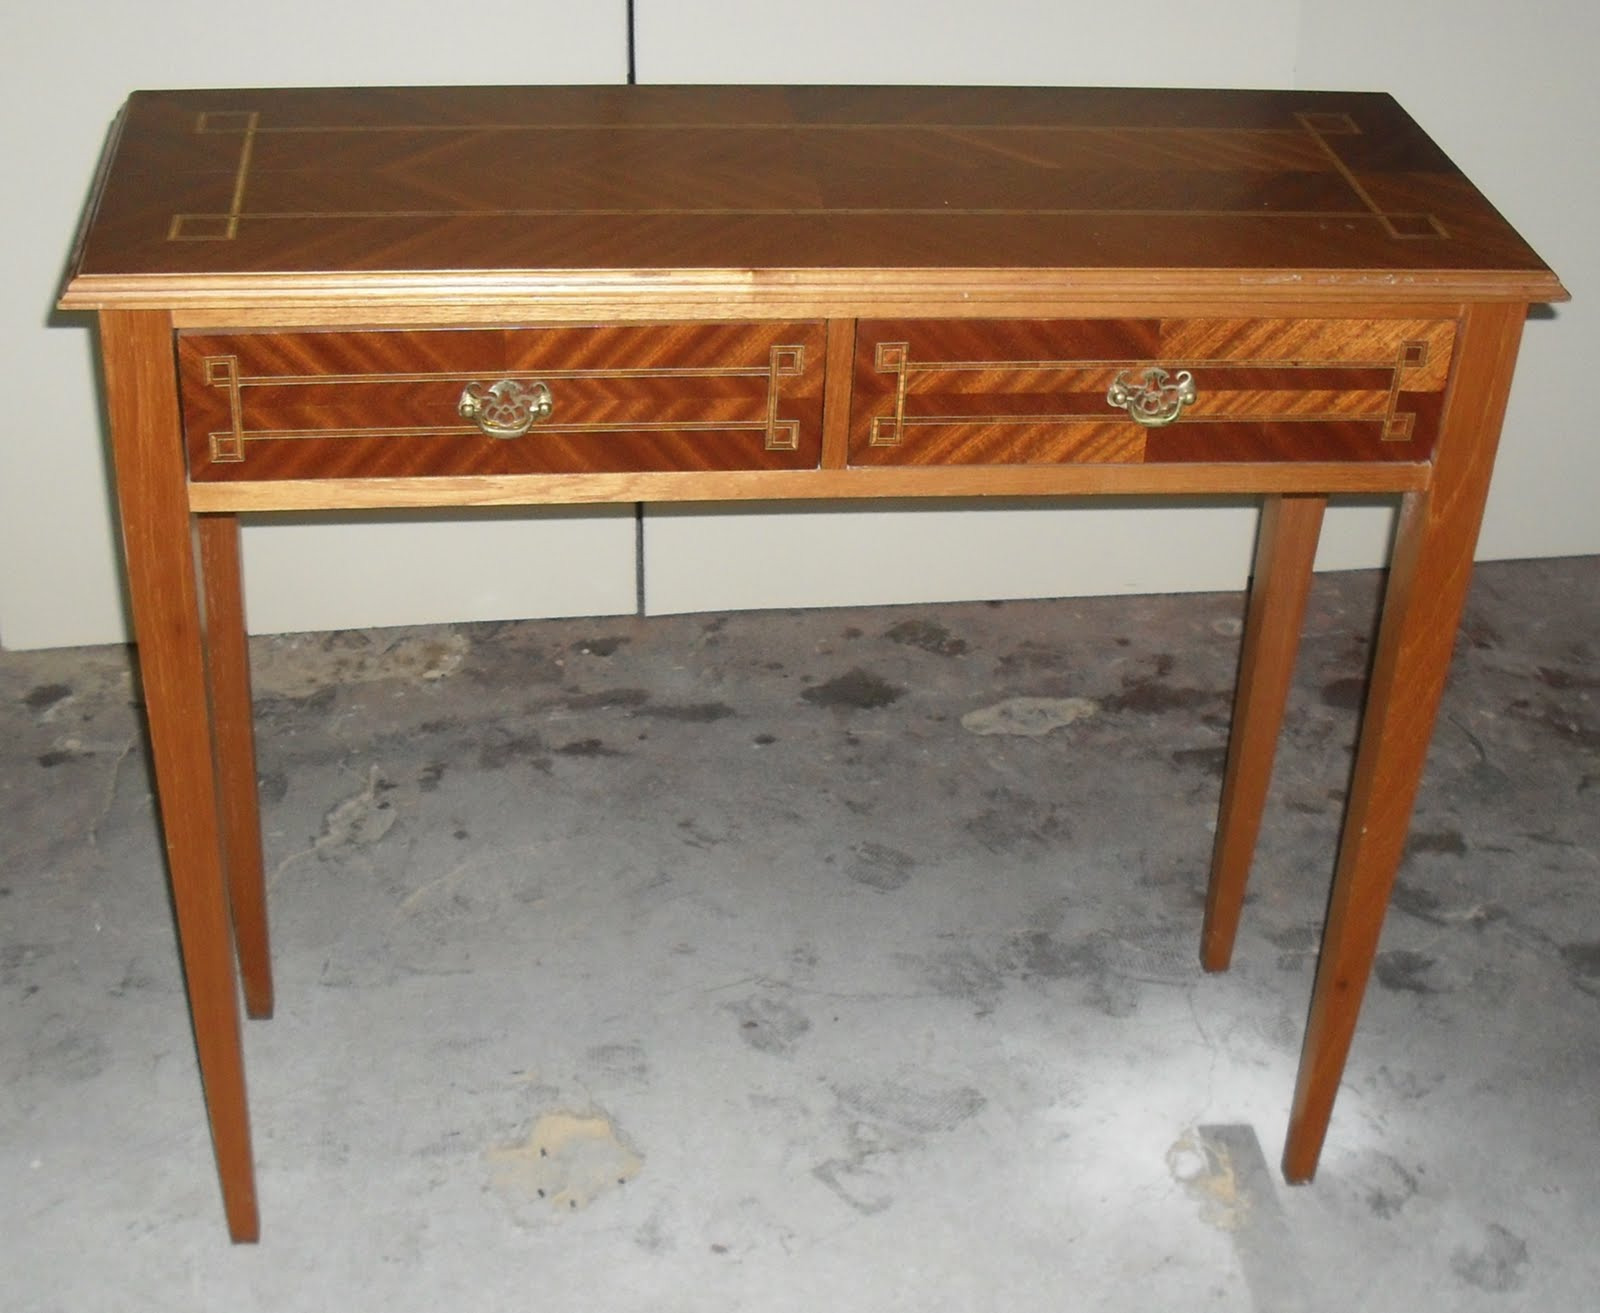 Guti rrez muebles dise o escritorio con marqueter a for Muebles escritorio diseno